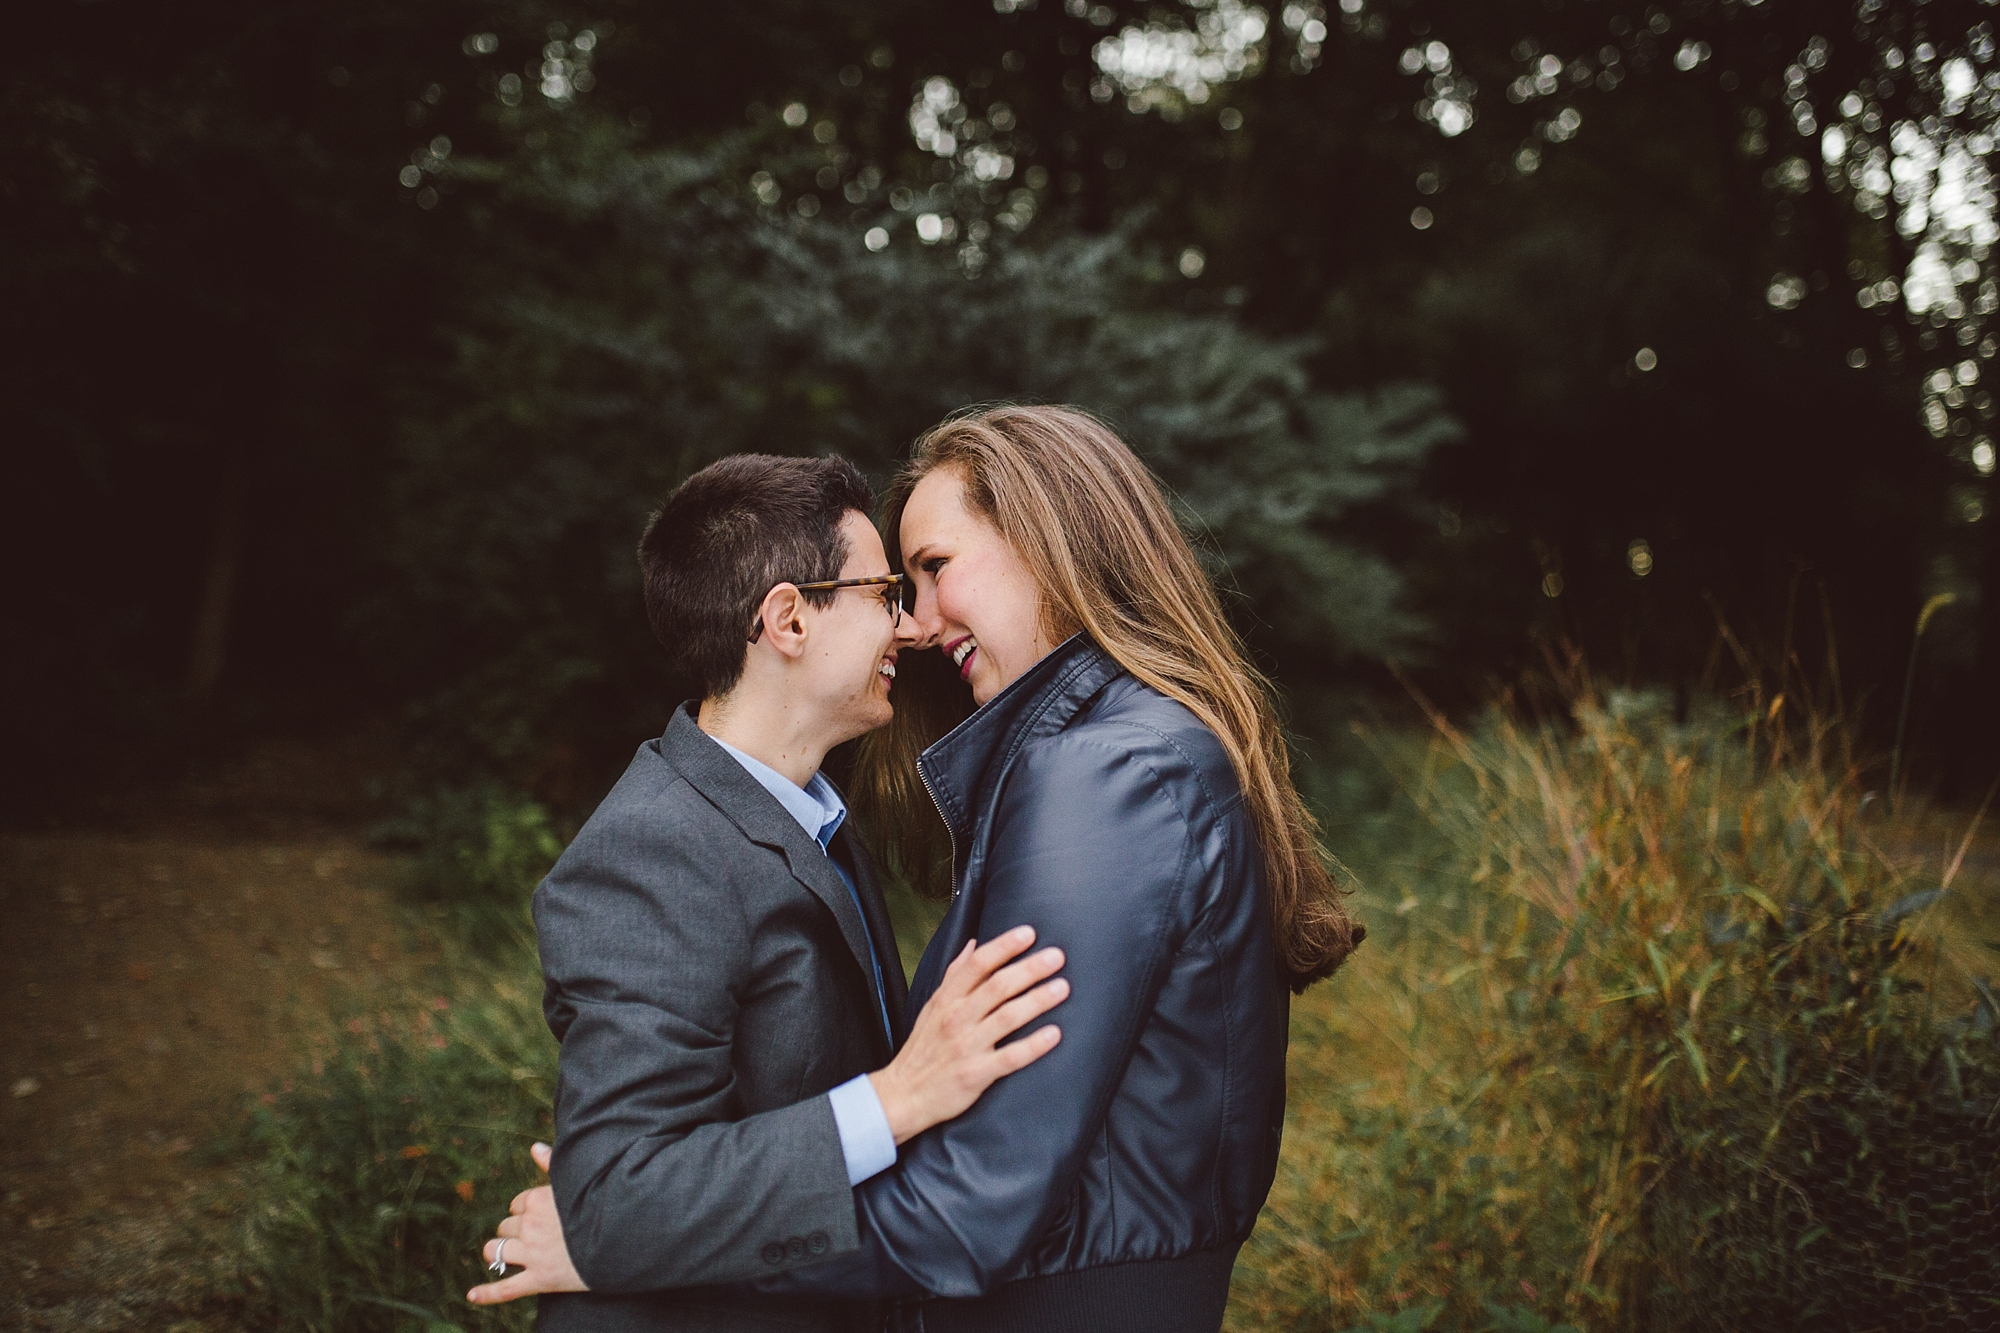 Joe_Mac_Creative_Philadelphila_Wedding_Photography_LGBTQ_Gay_Lesbian_Queer__0036.jpg